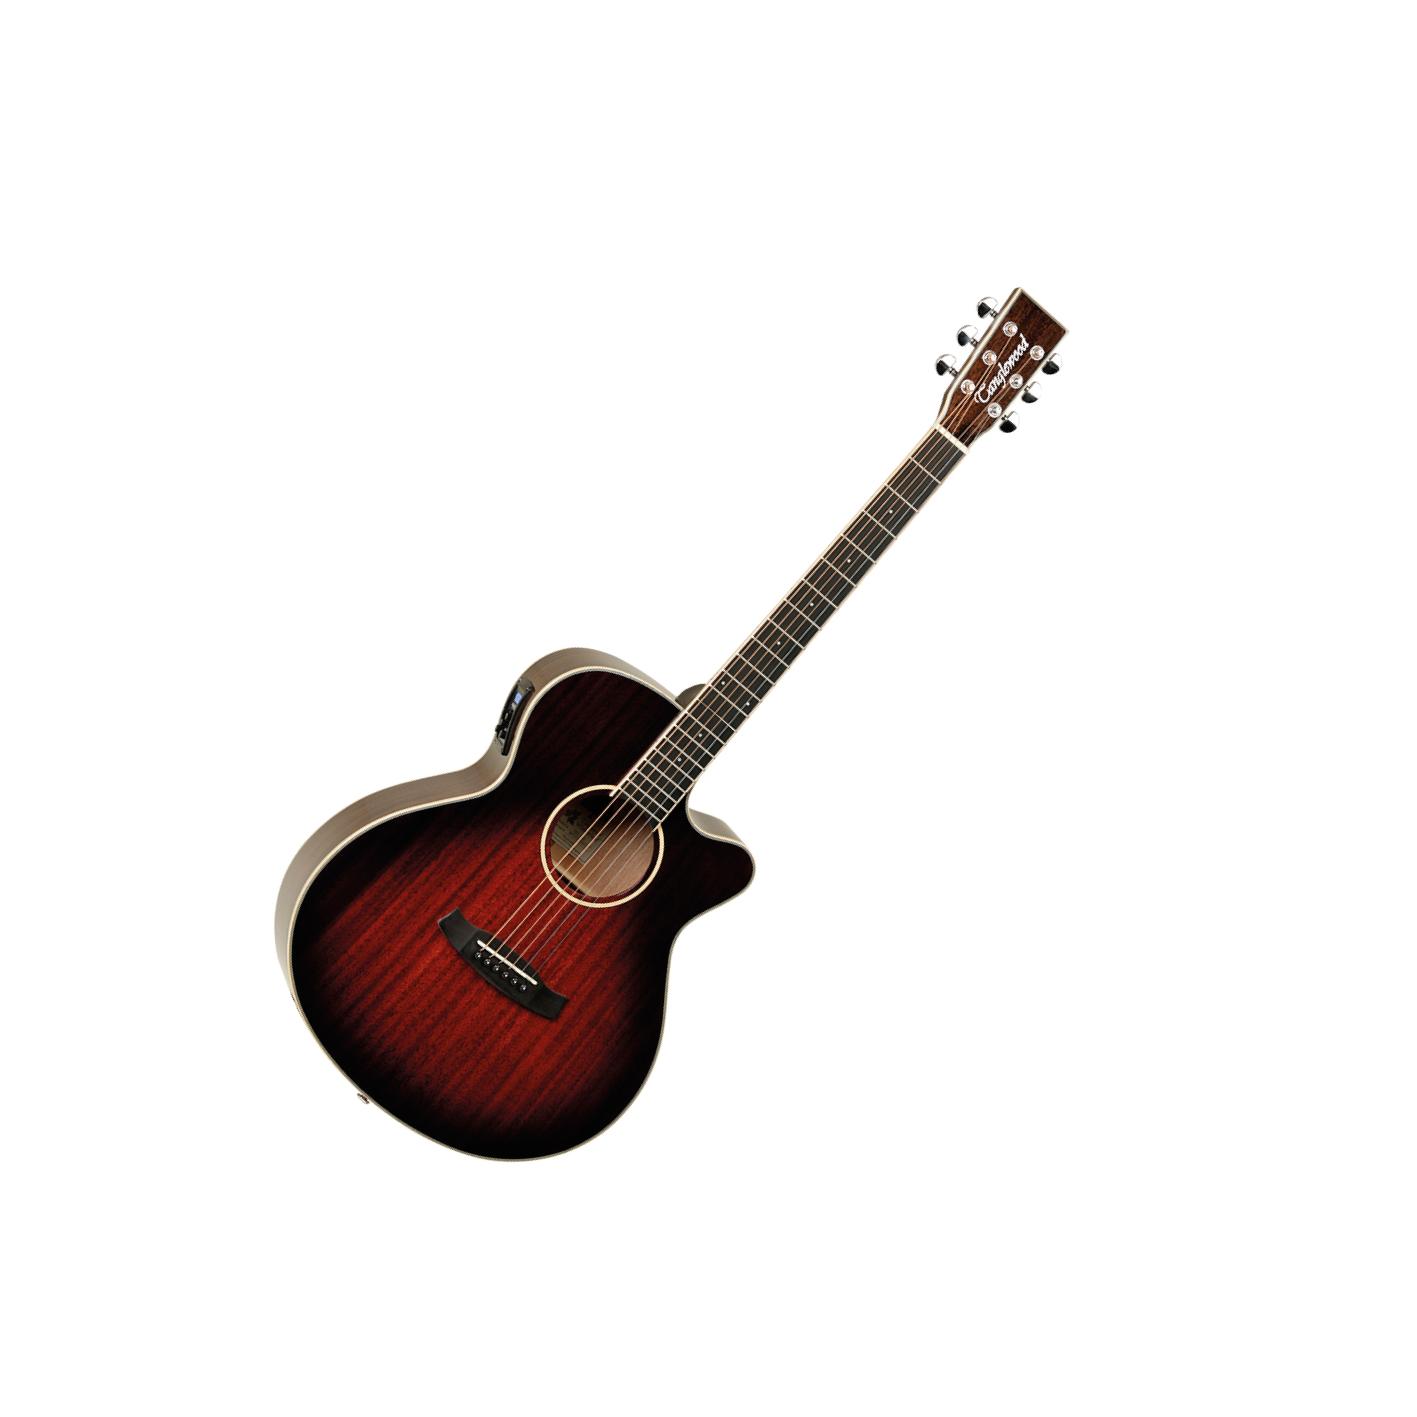 Tanglewood Winterleaf TW4-E Super Folk Antique Violin Burst